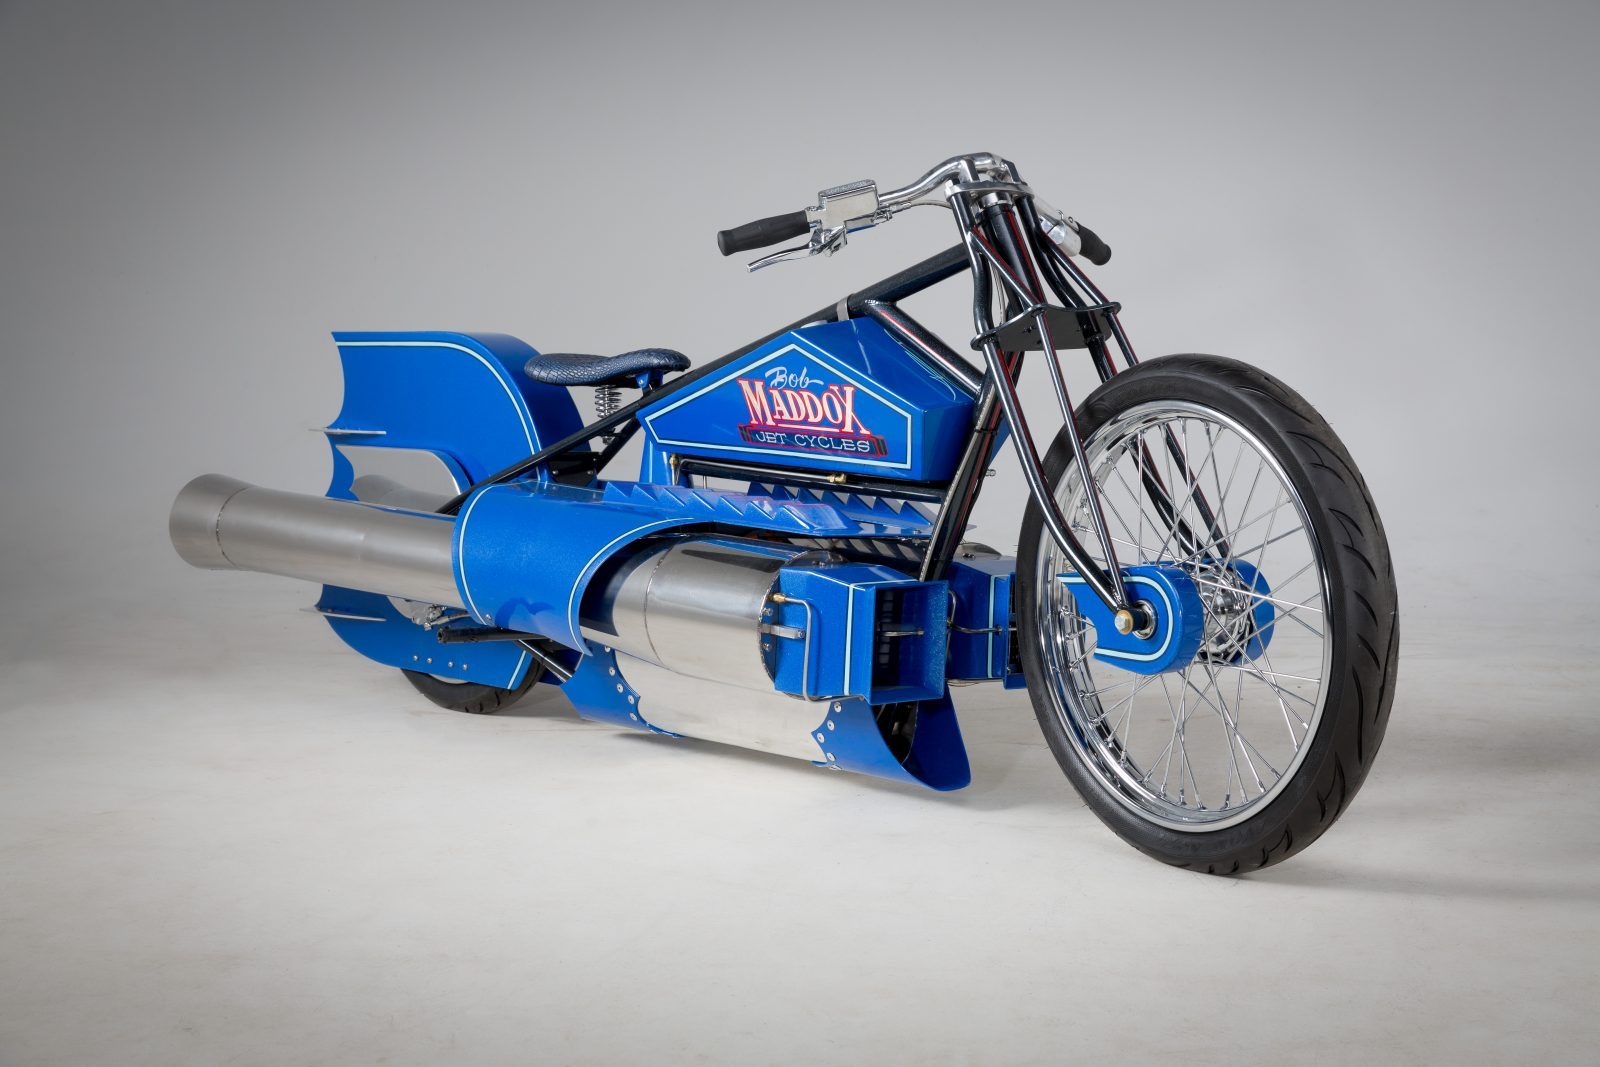 Maddox Pulsejet Cycle 6 1600x1067 - Maddox Pulsejet Motorcycle